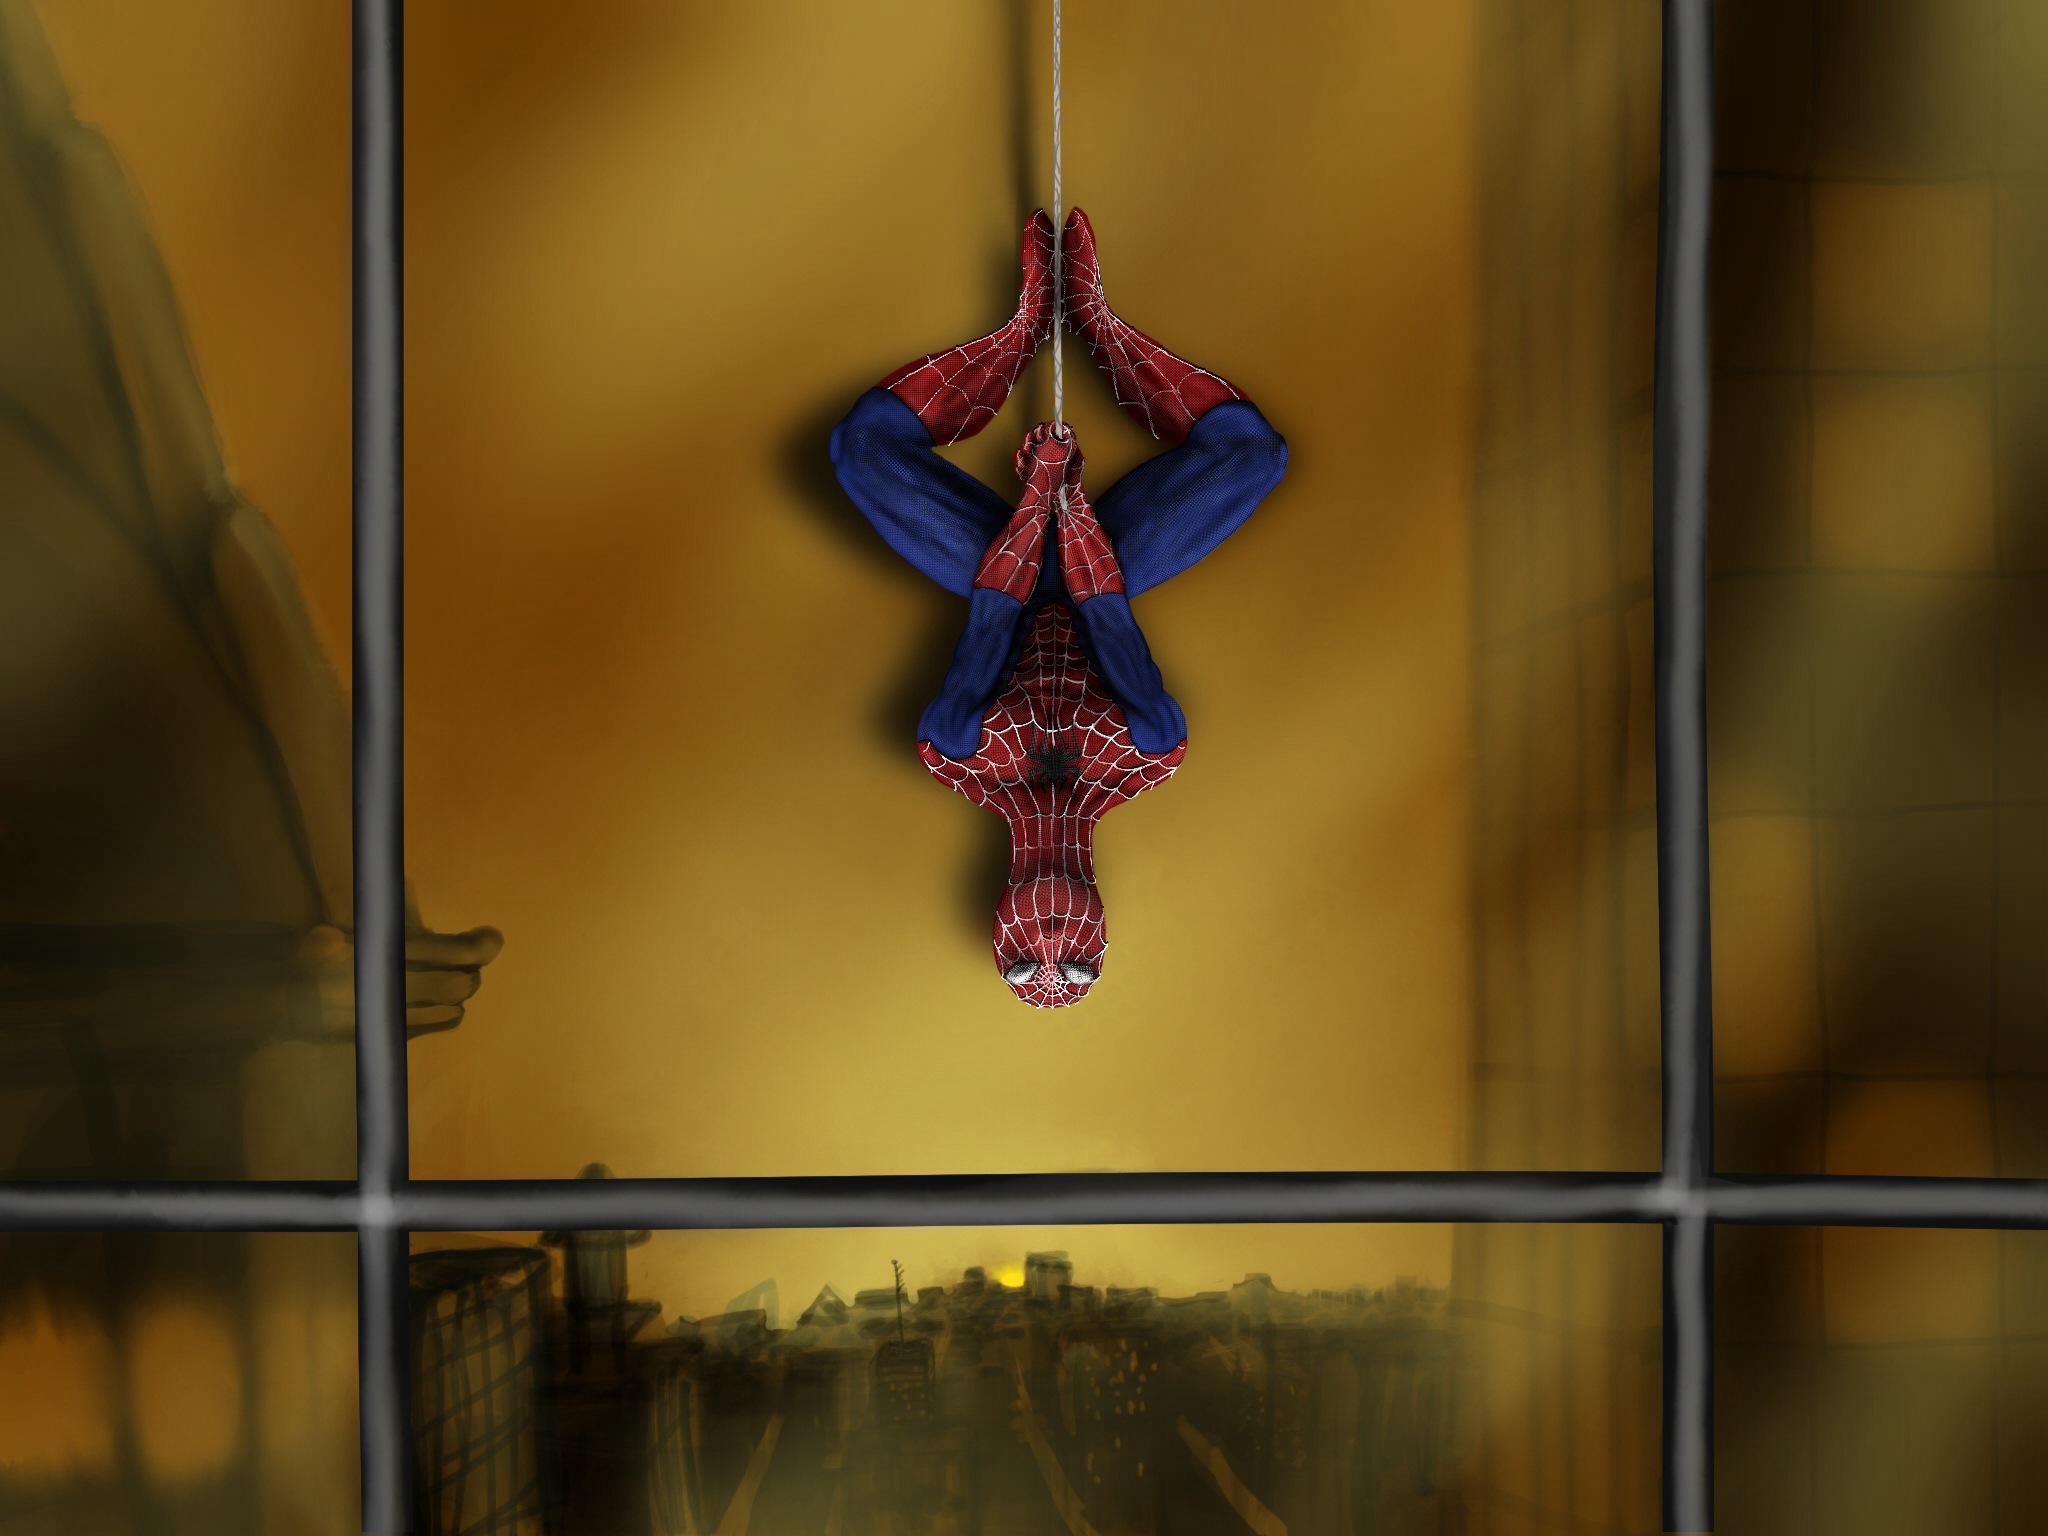 Spiderman enjoying the view